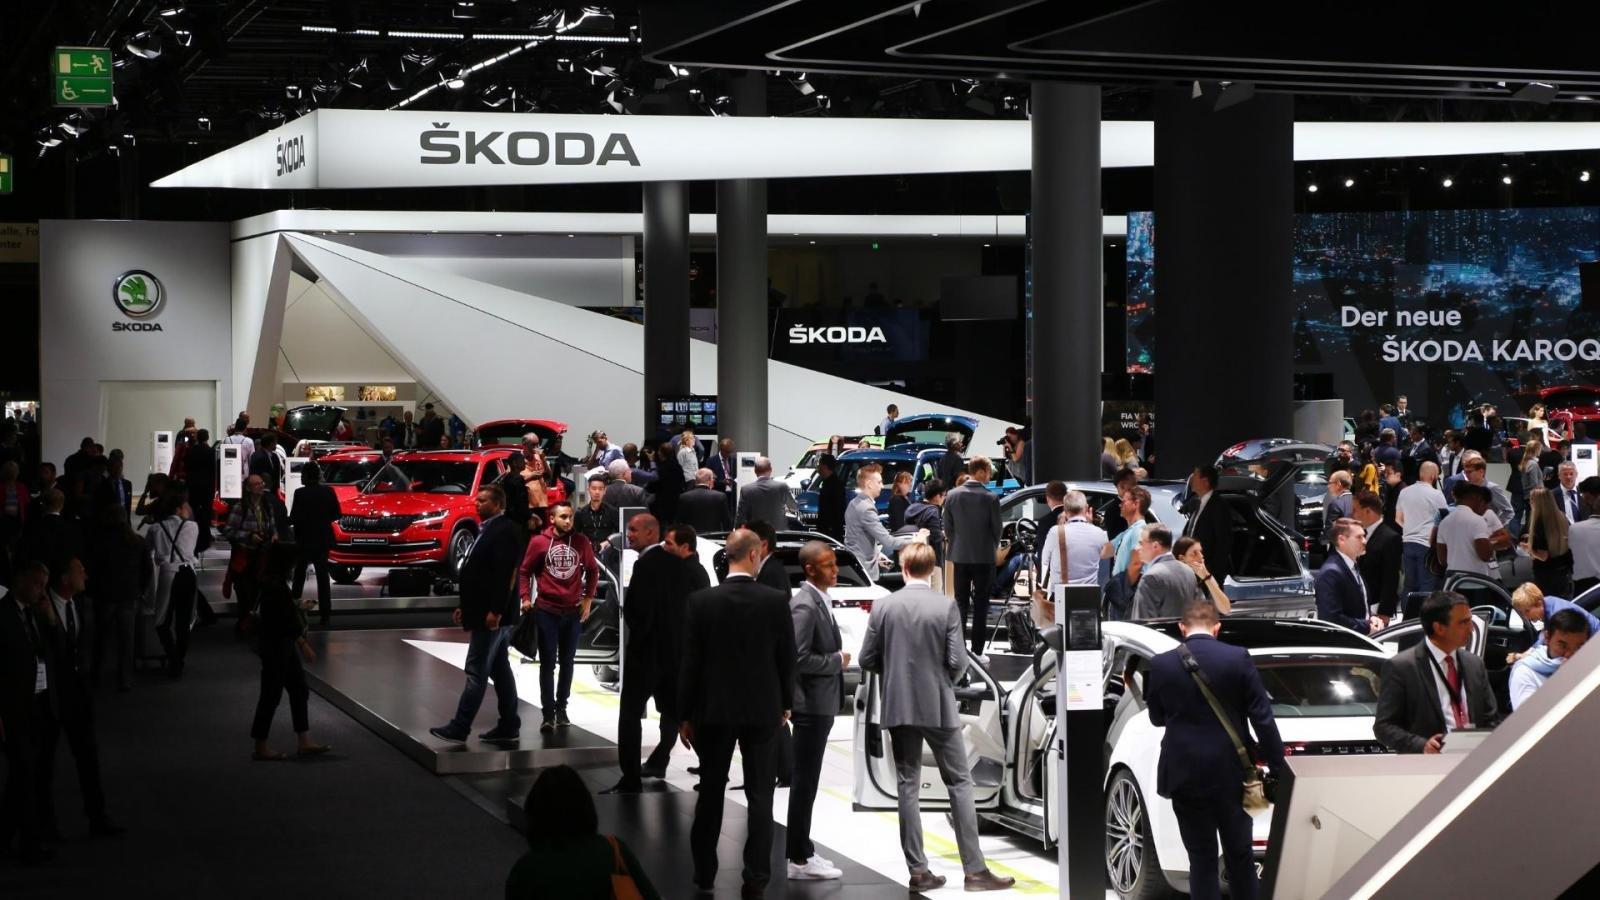 Triển lãm ô tô Frankfurt 2019 sắp khai mạc